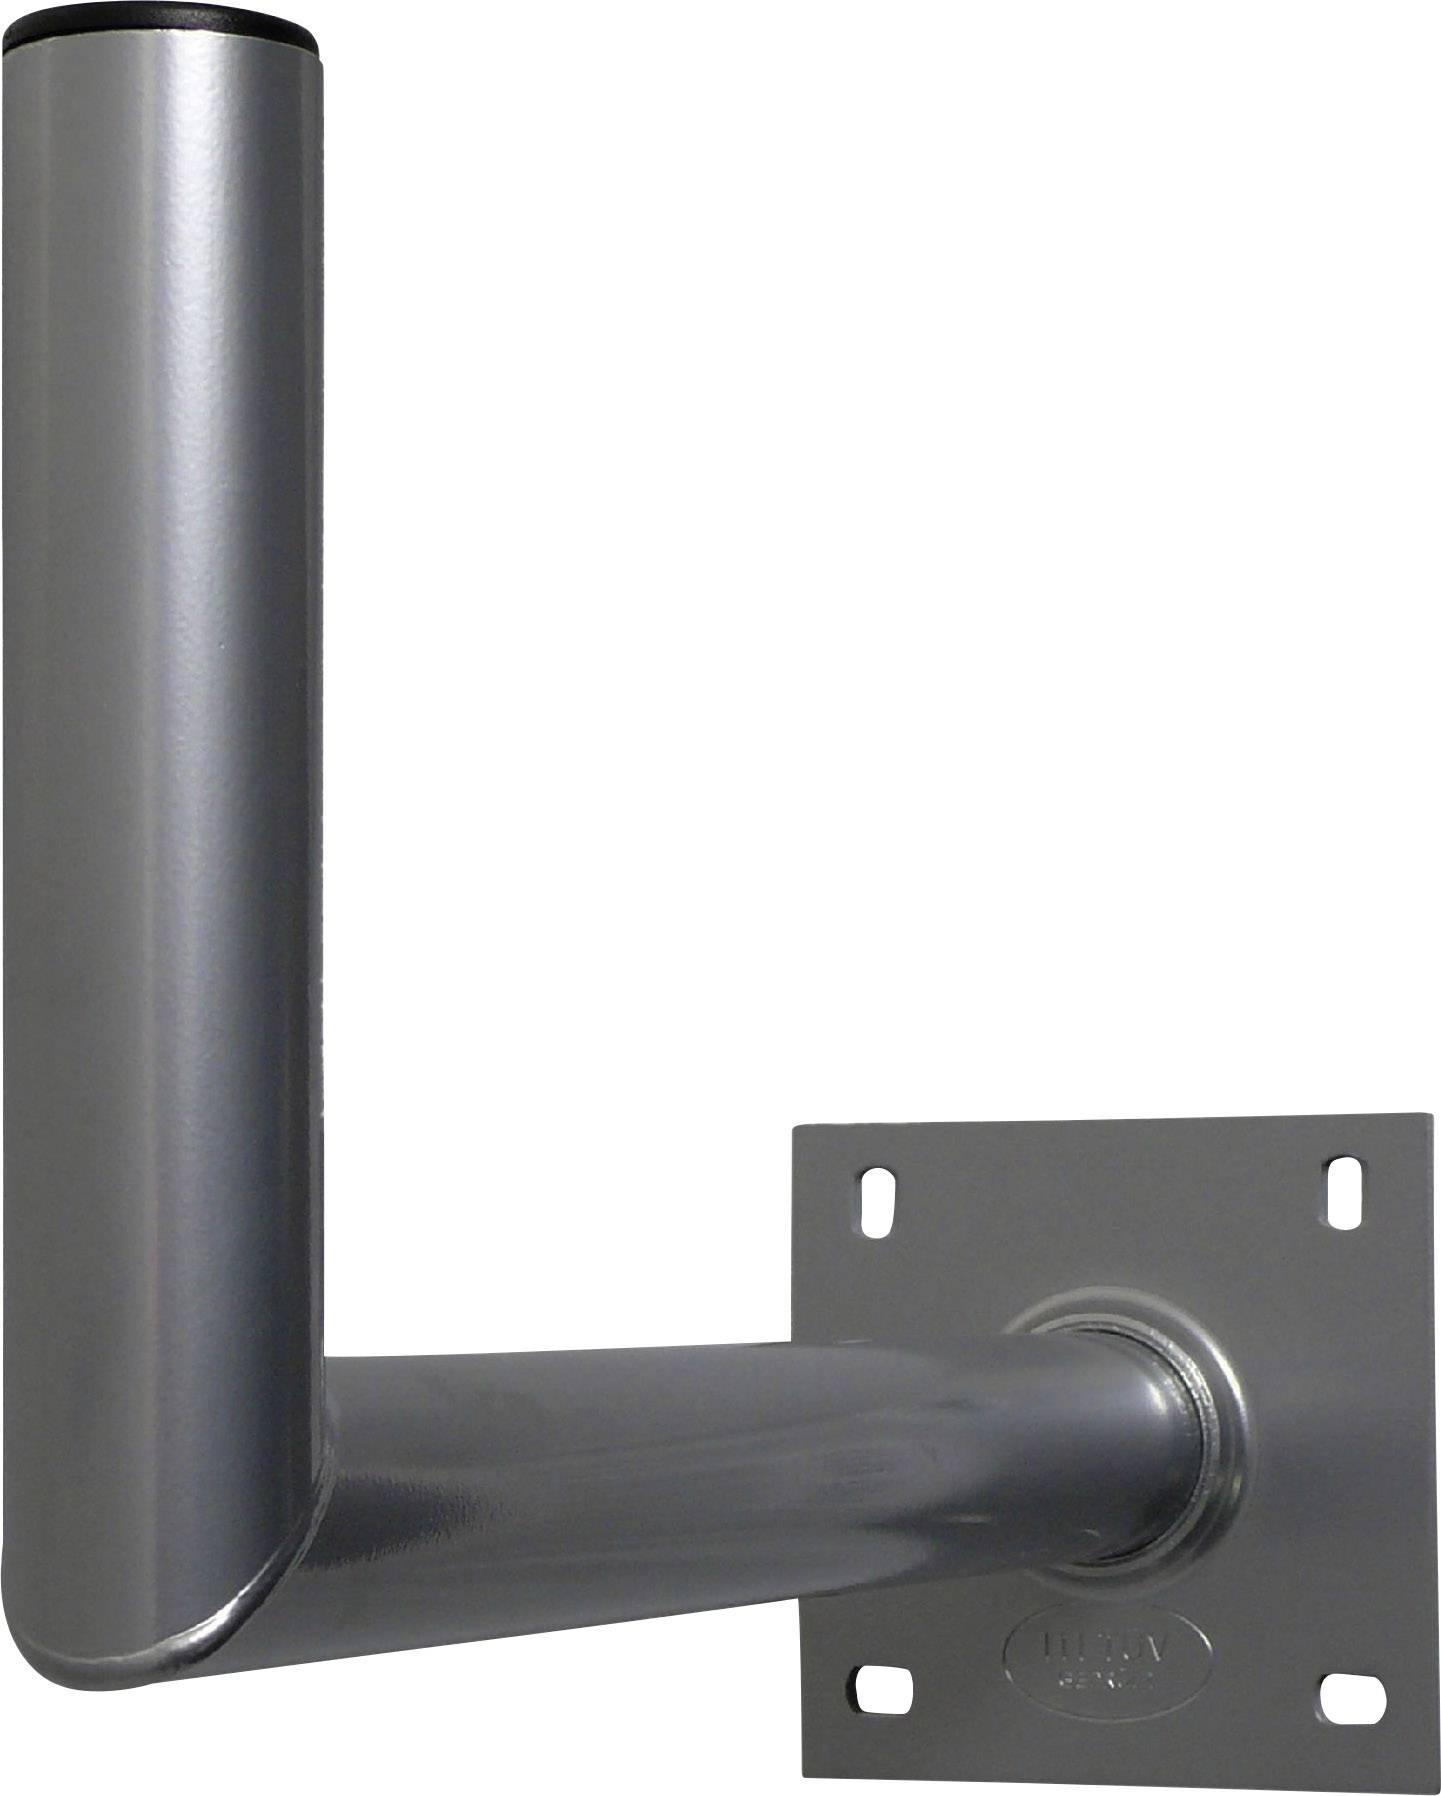 SAT stojan A.S. SAT 10145, 45 cm, Ø do 90 cm, hliník, stříbrná